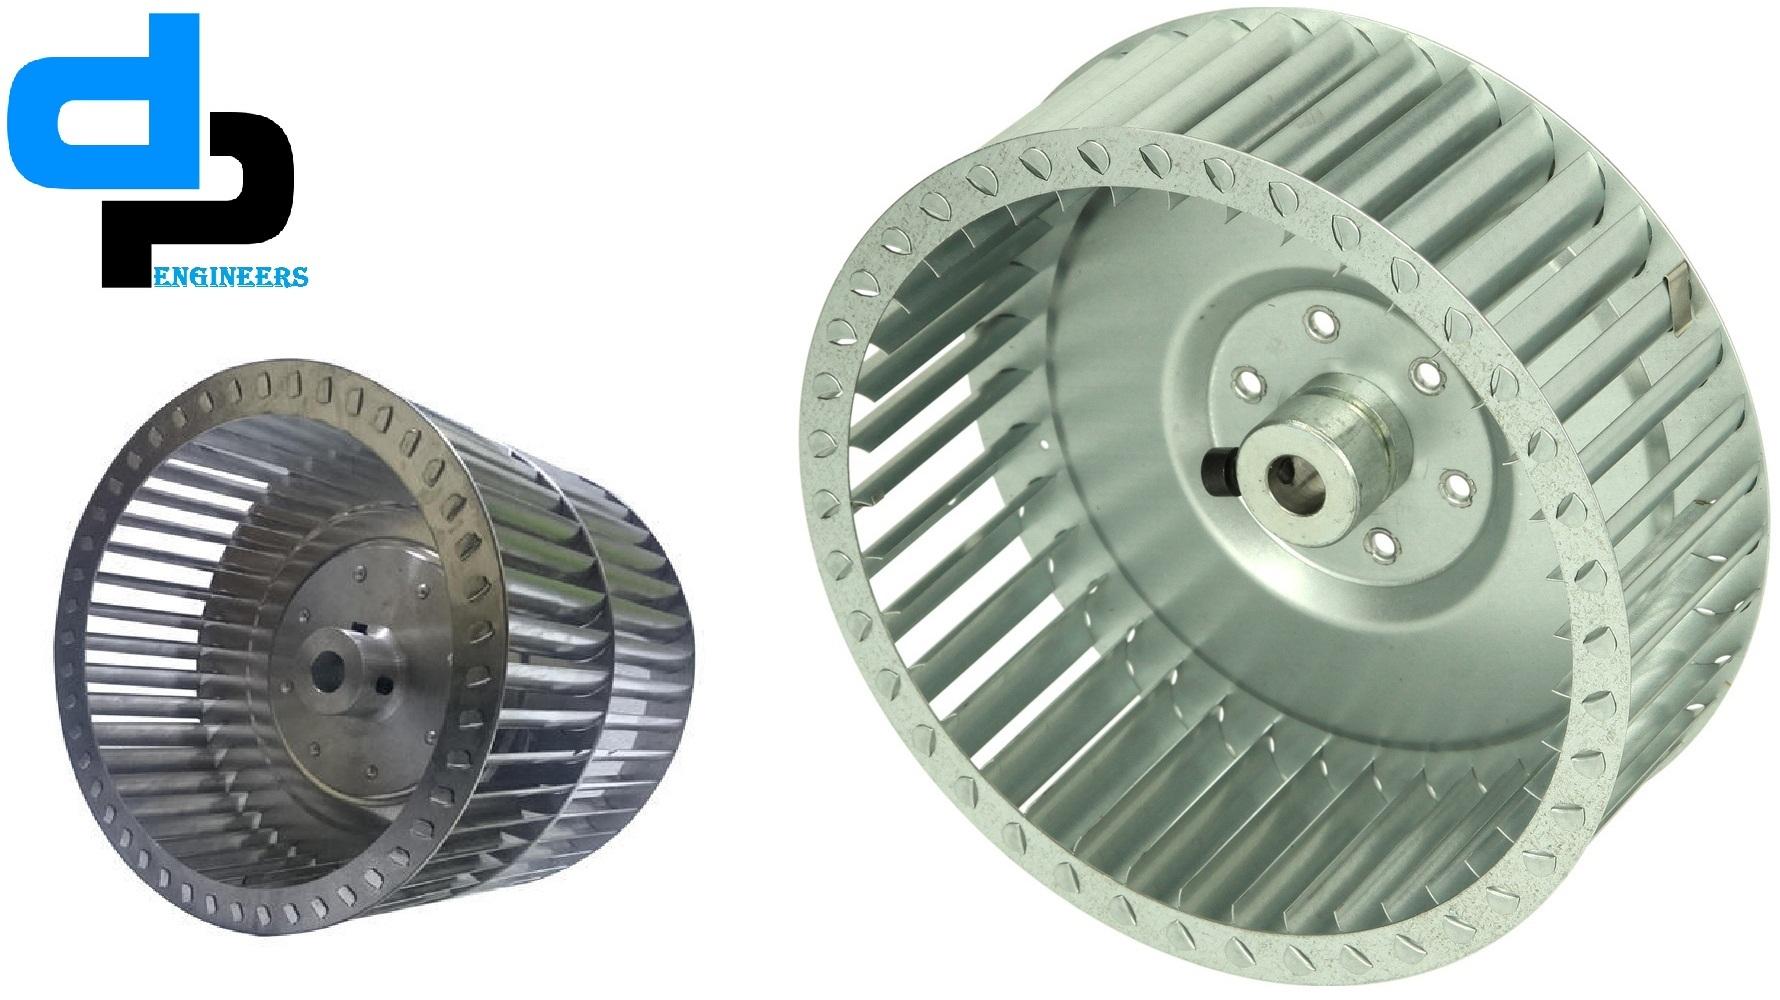 SISW Centrifugal Blower 230 MM X 125 MM